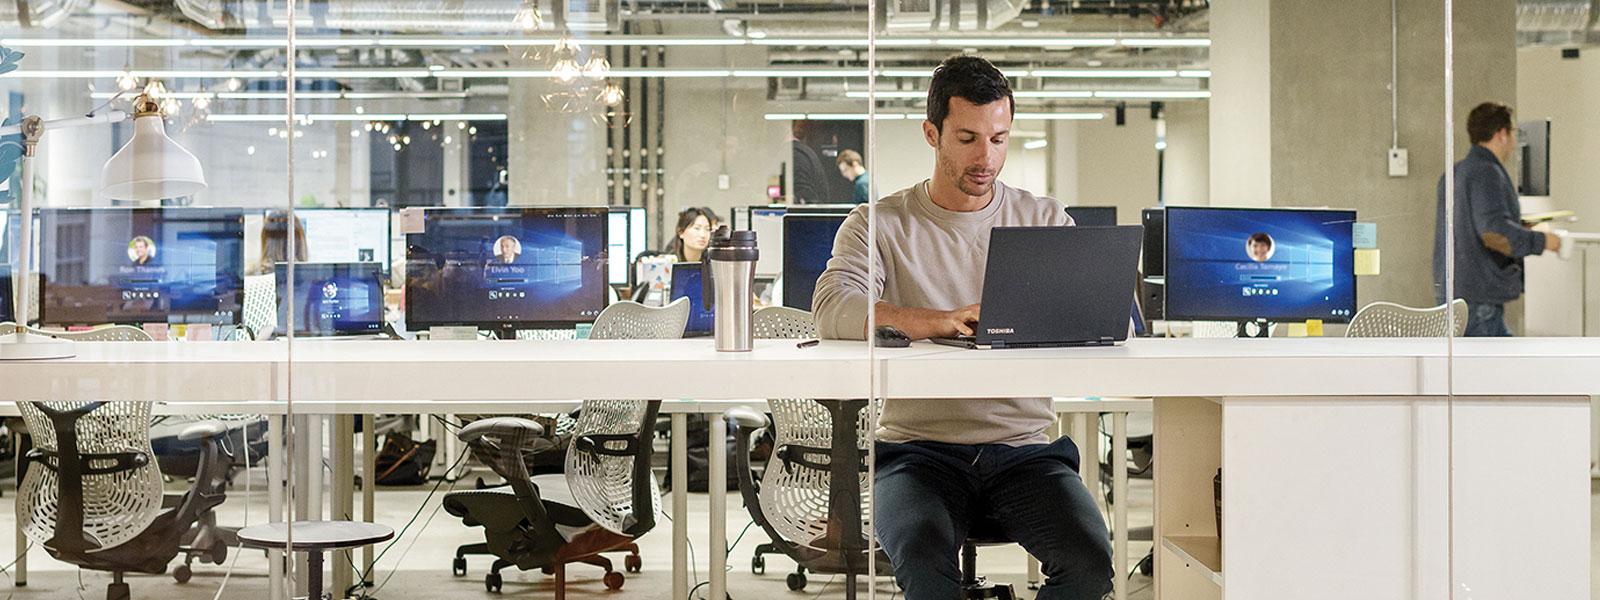 Man using laptop in open office space